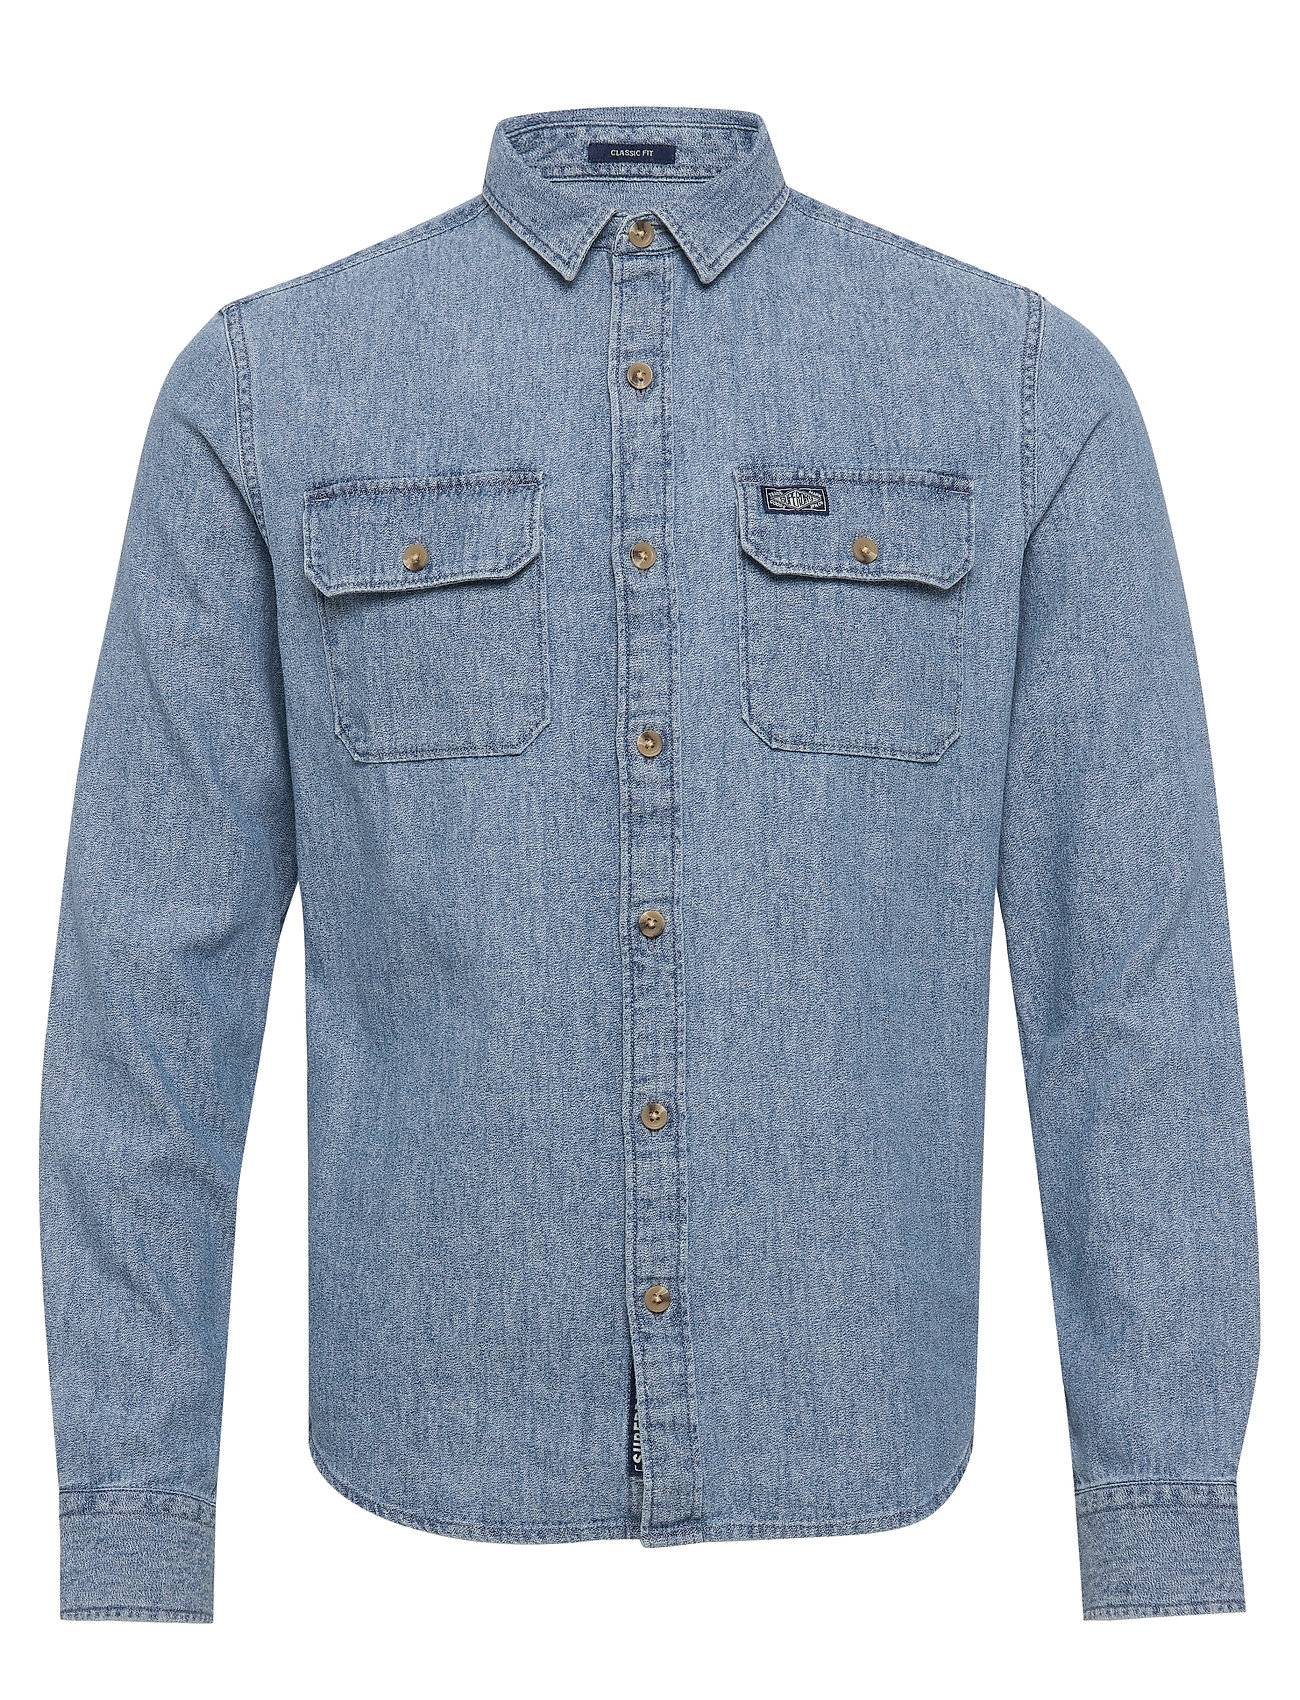 Image of Superdry Merchant Milled Lite L/S Shirt Paita Rento Casual Sininen Superdry